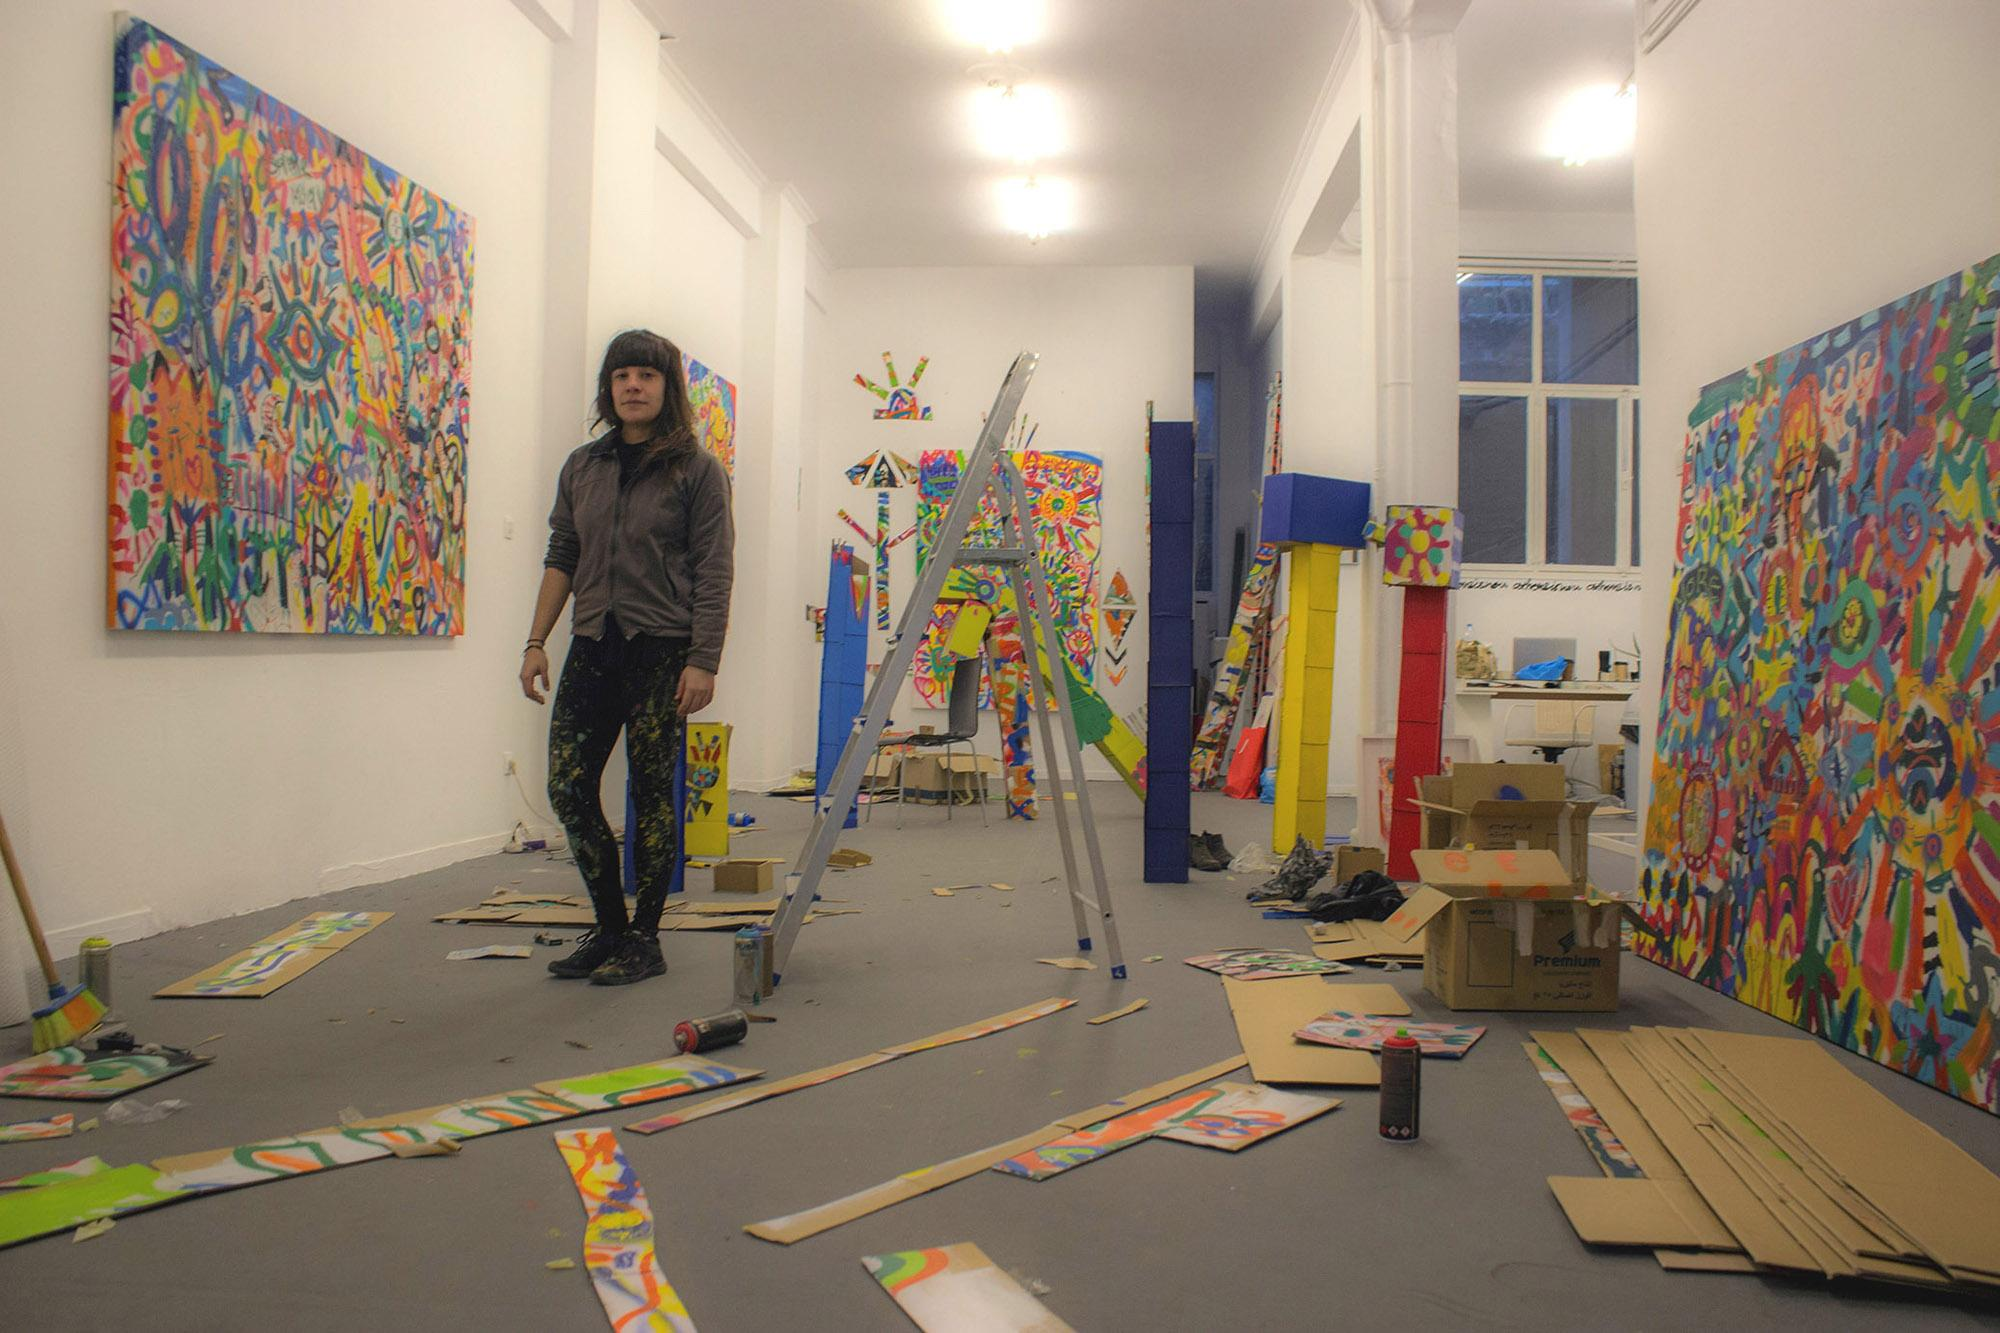 Marilia Kolibiri: Upside Down - Image 2